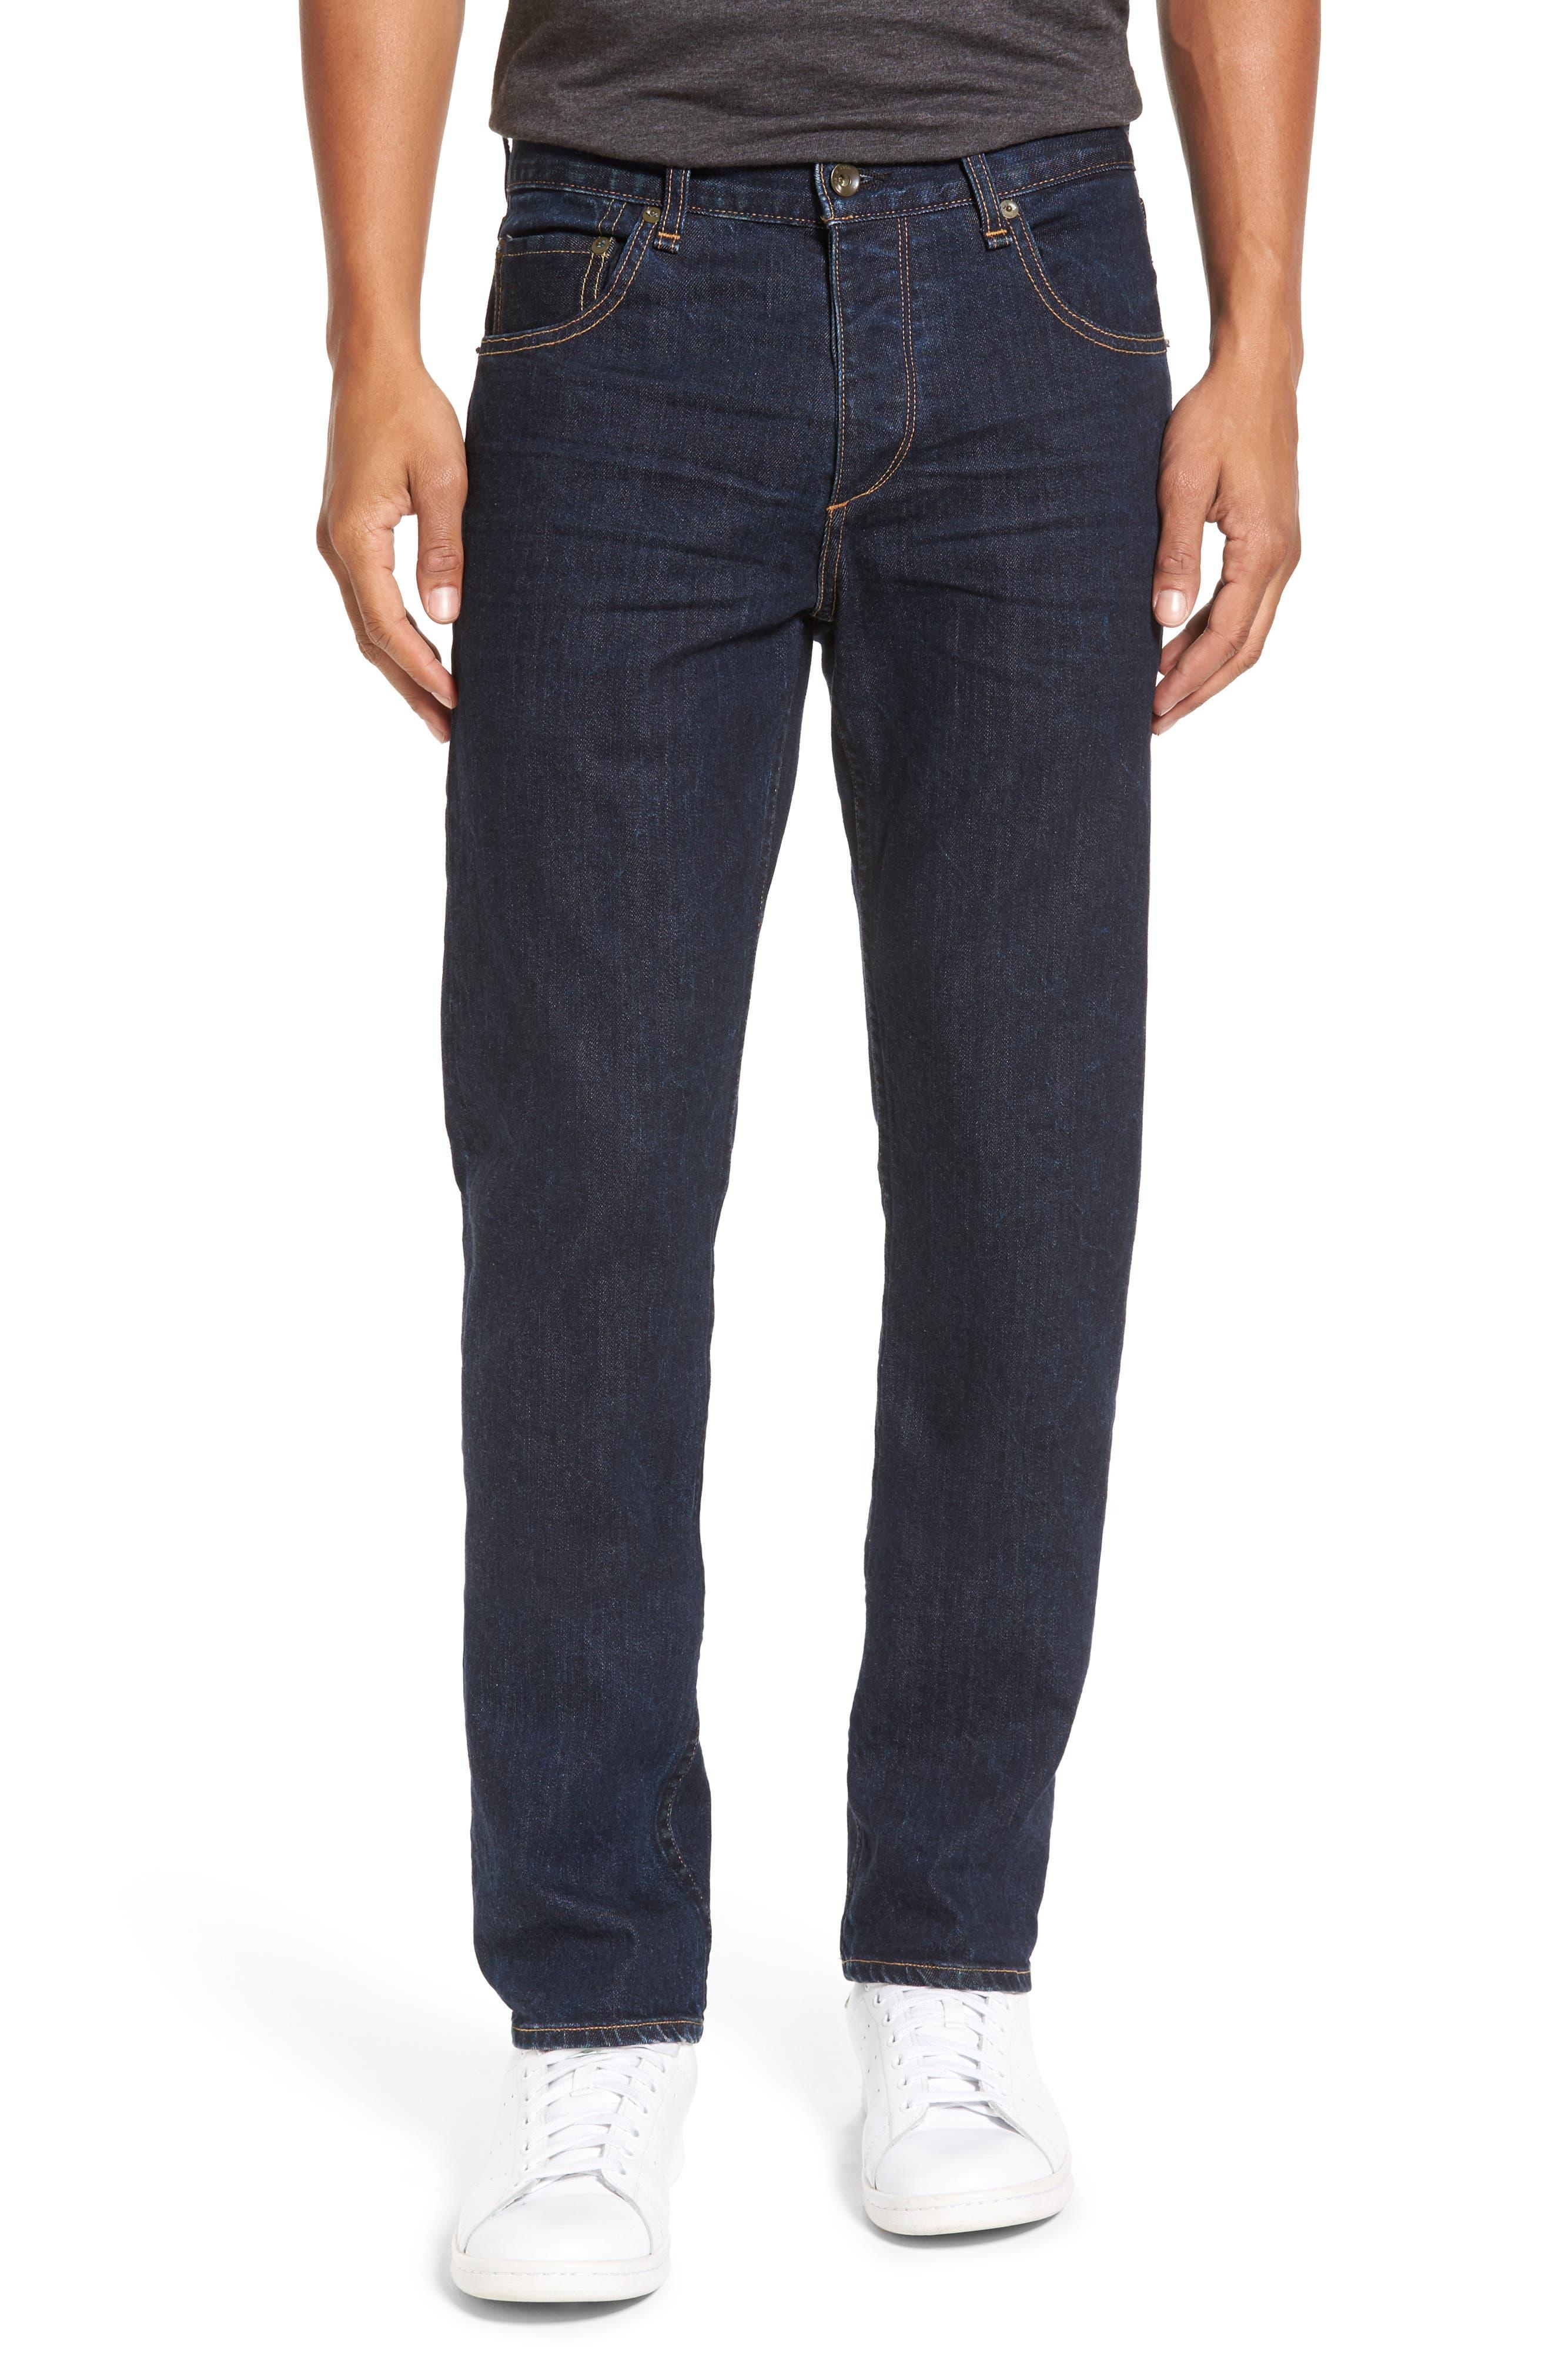 RAG & BONE, Standard Issue Fit 3 Slim Straight Leg Jeans, Main thumbnail 1, color, HERITAGE